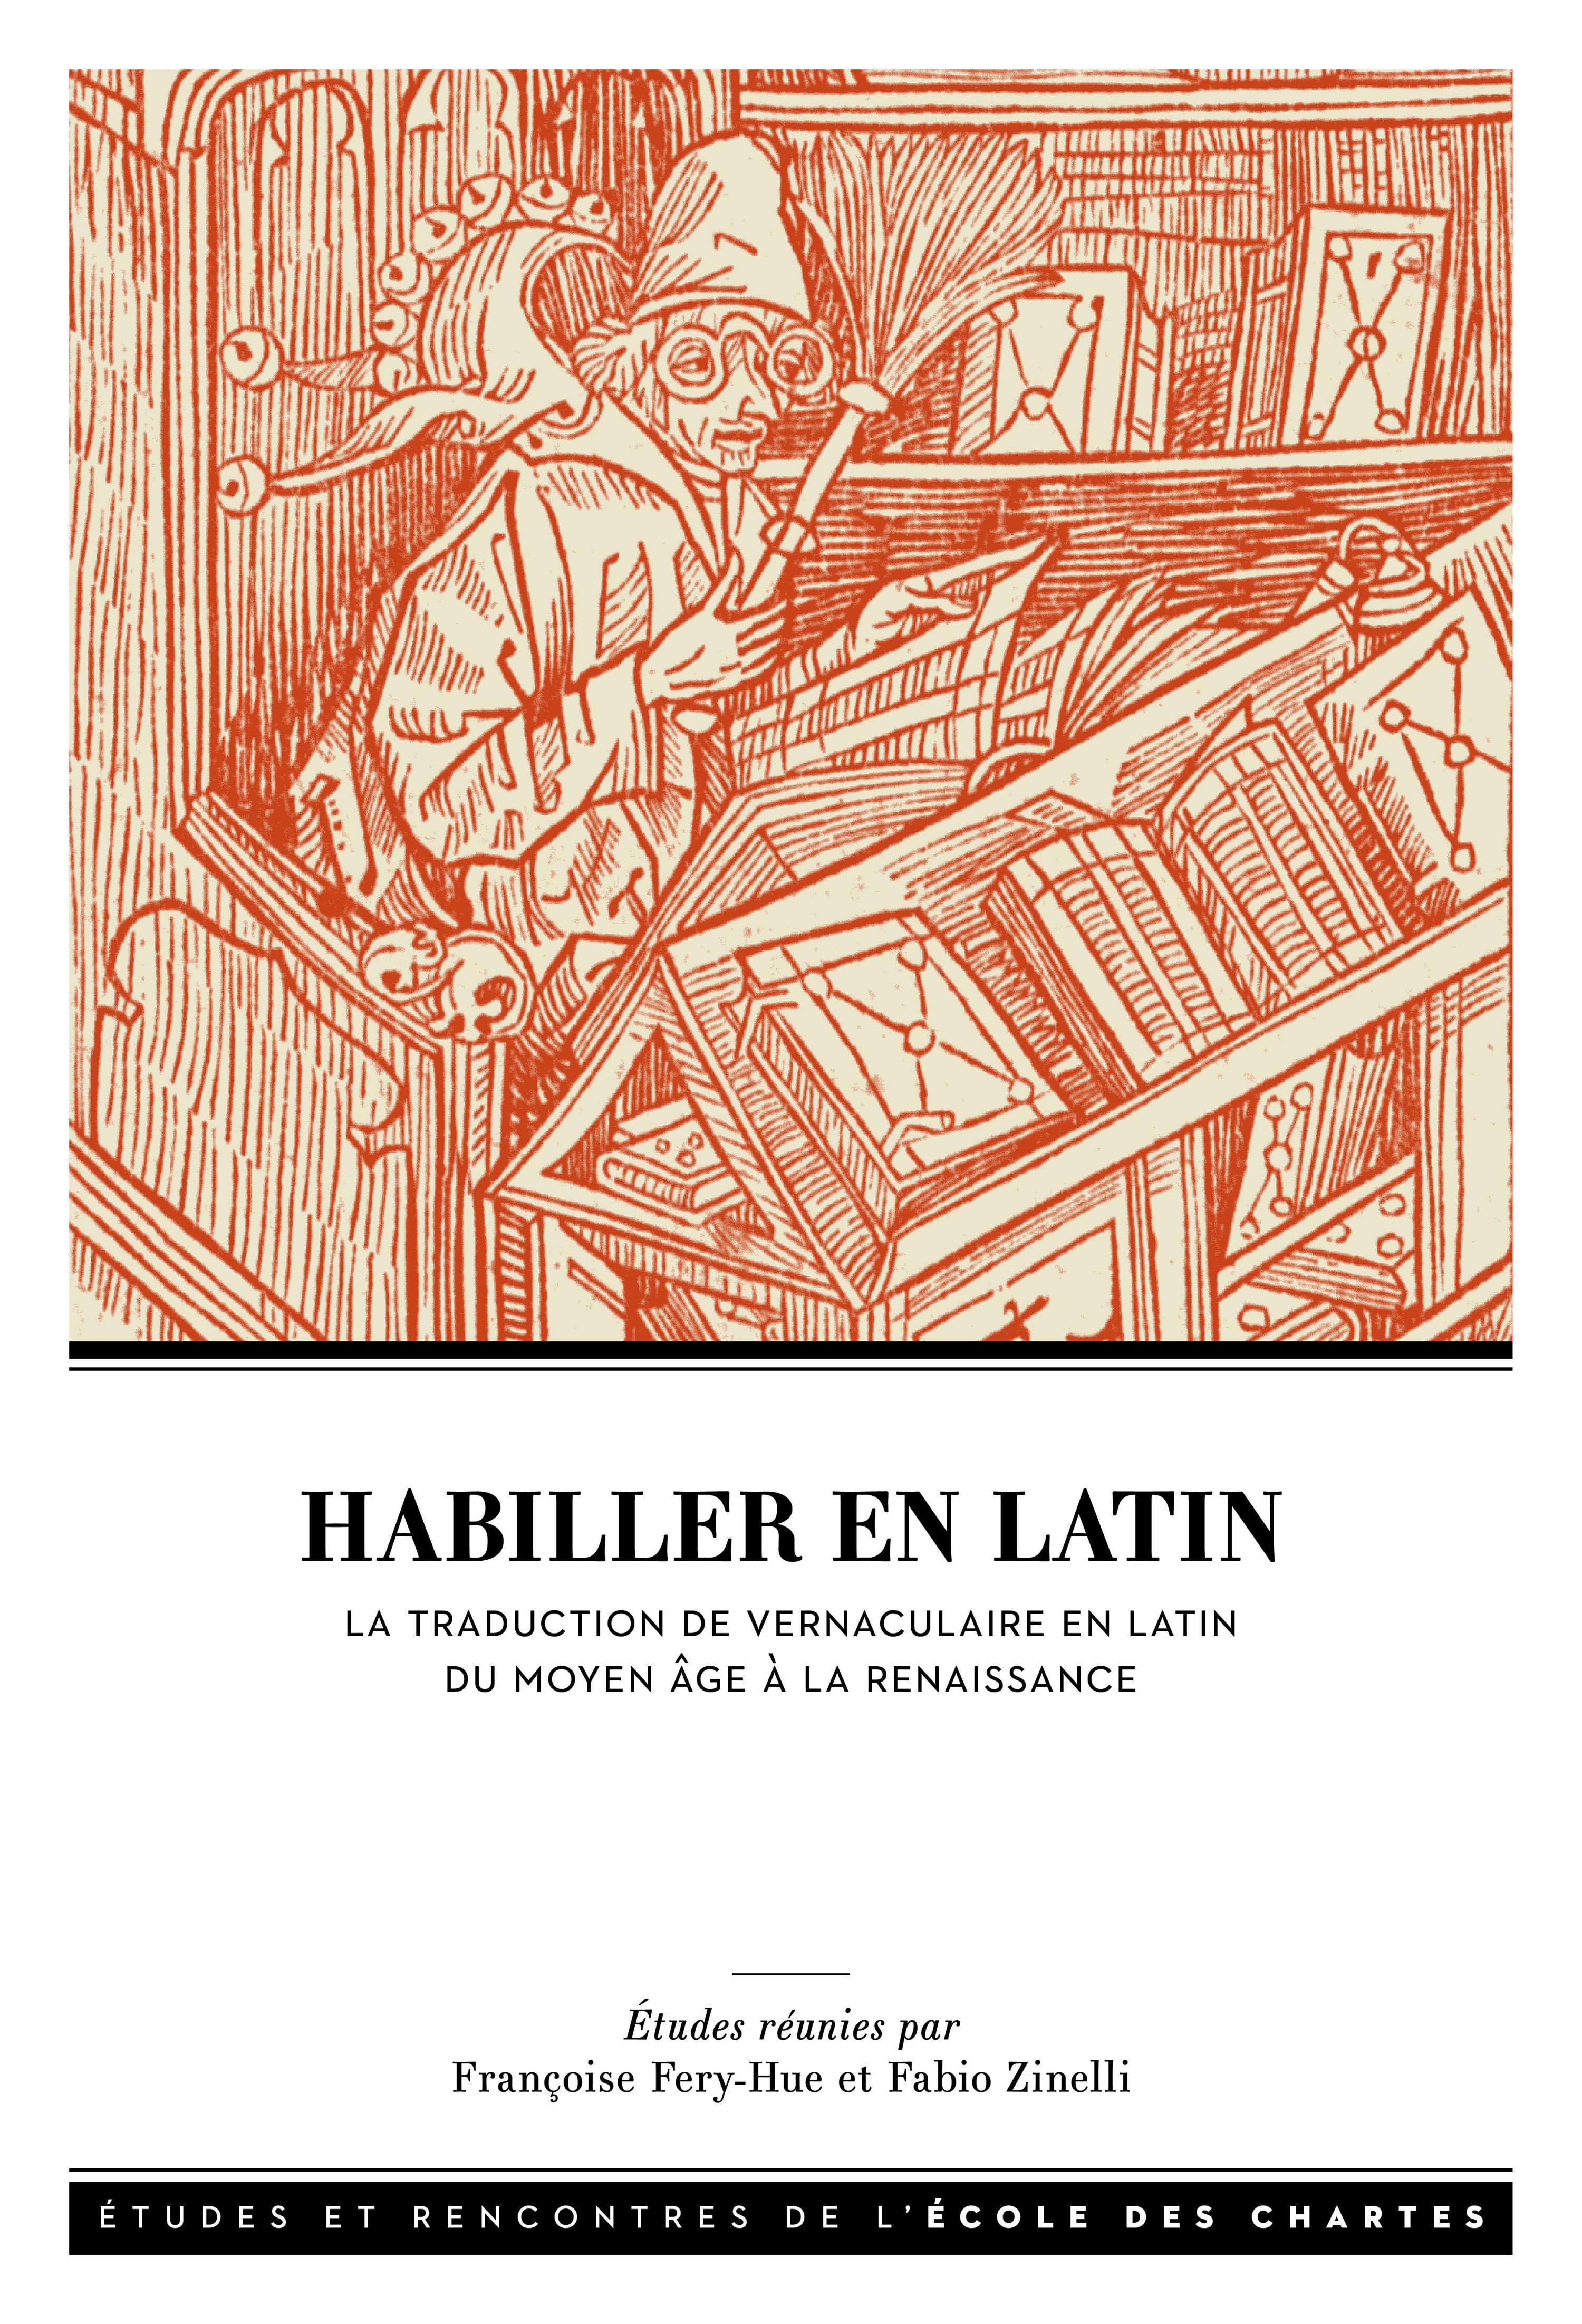 HABILLER EN LATIN. LA TRADUCTION DE VERNACULAIRE EN LATIN ENTRE MOYEN